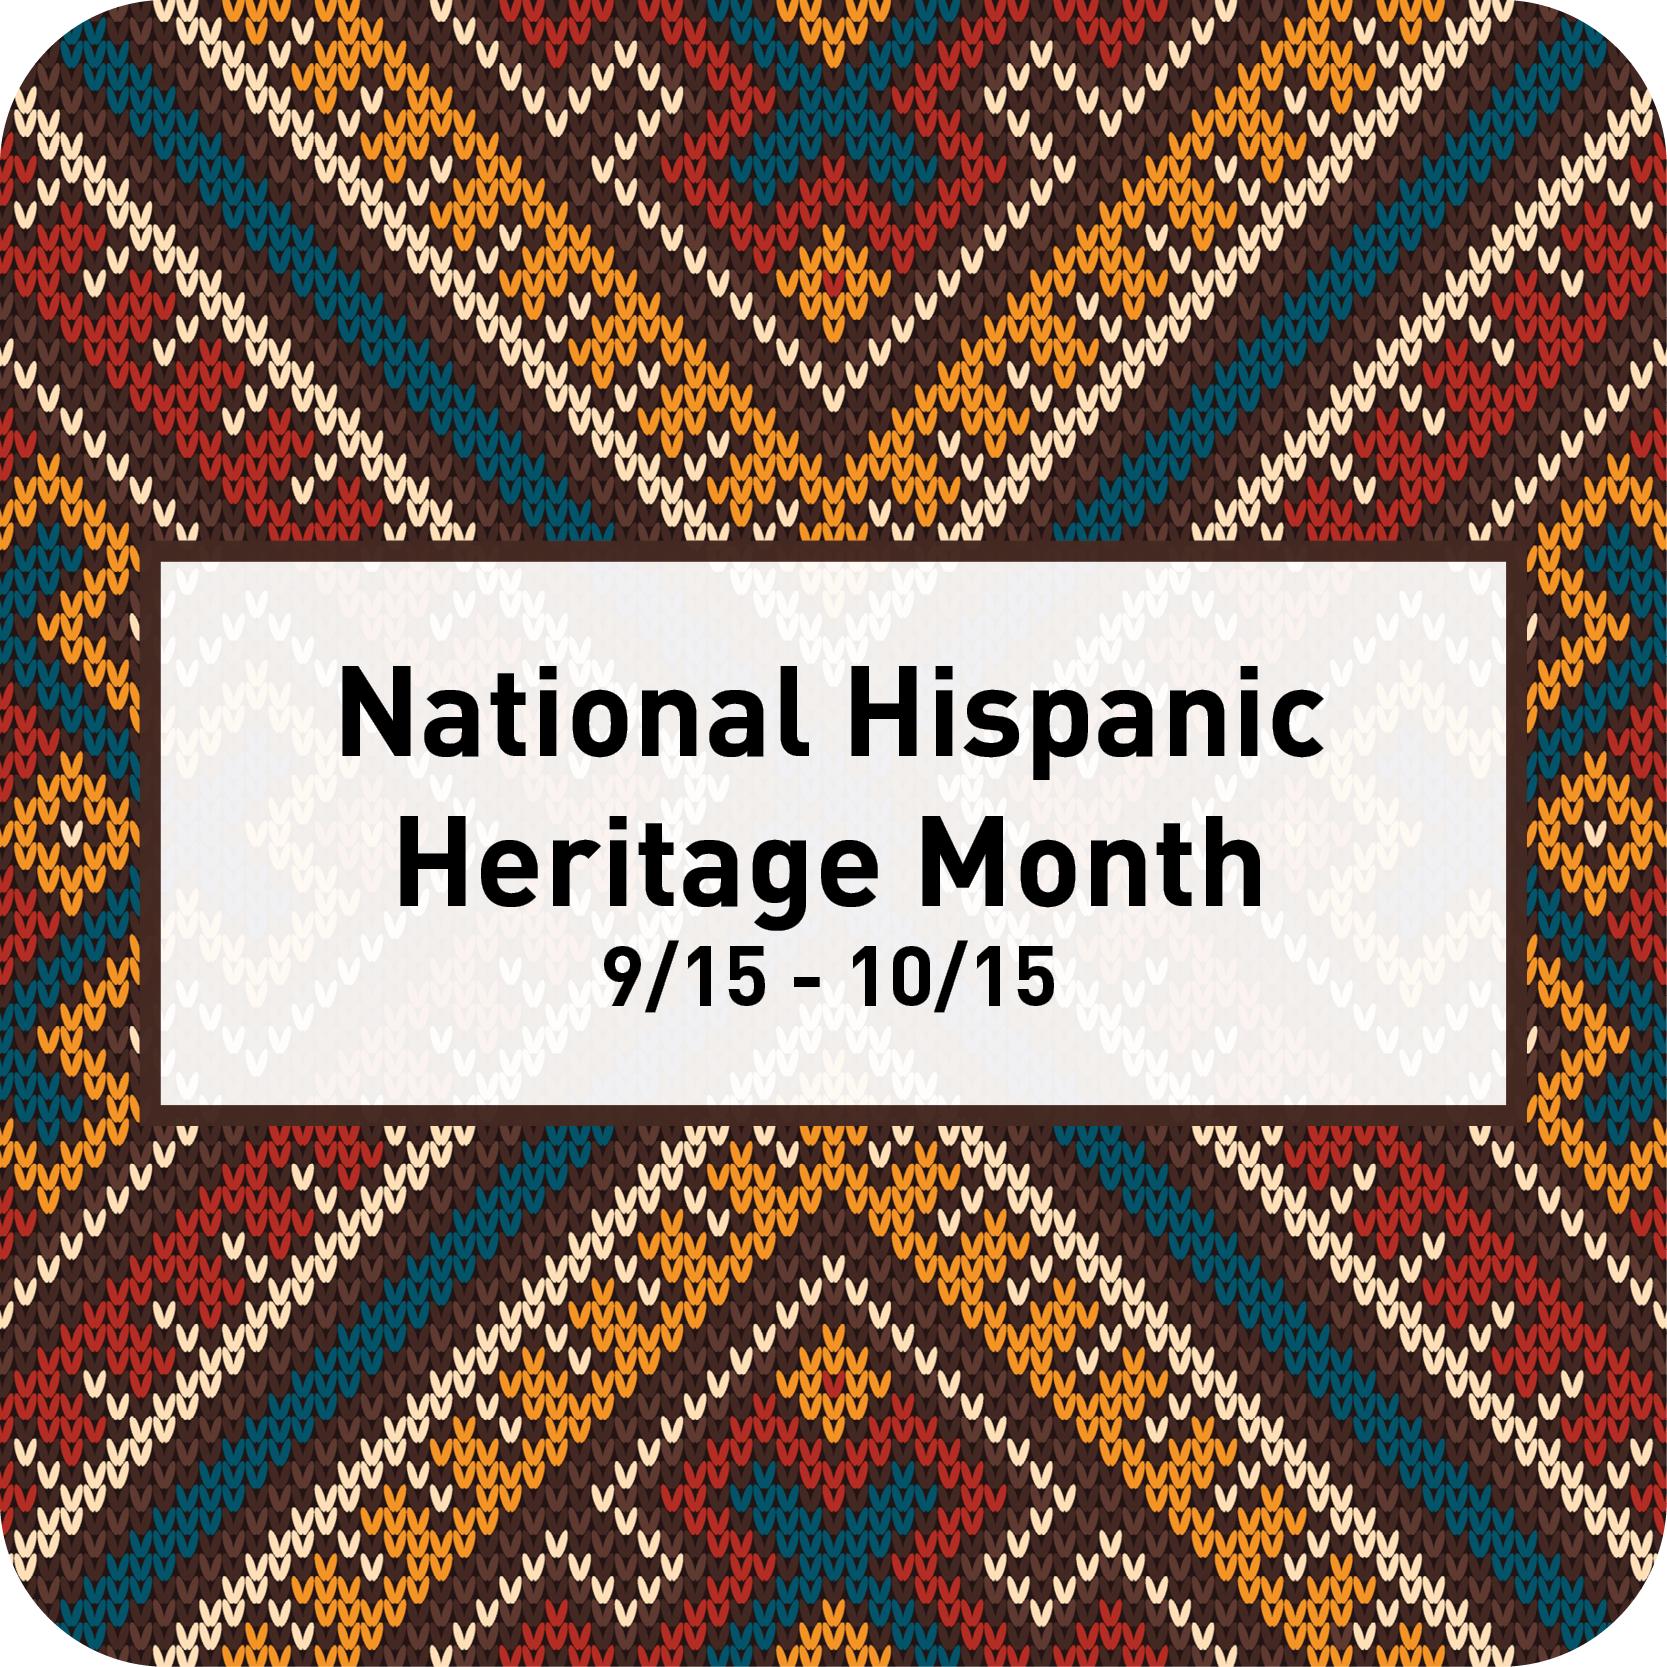 National Hispanic Heritage Month 9/15-10/15